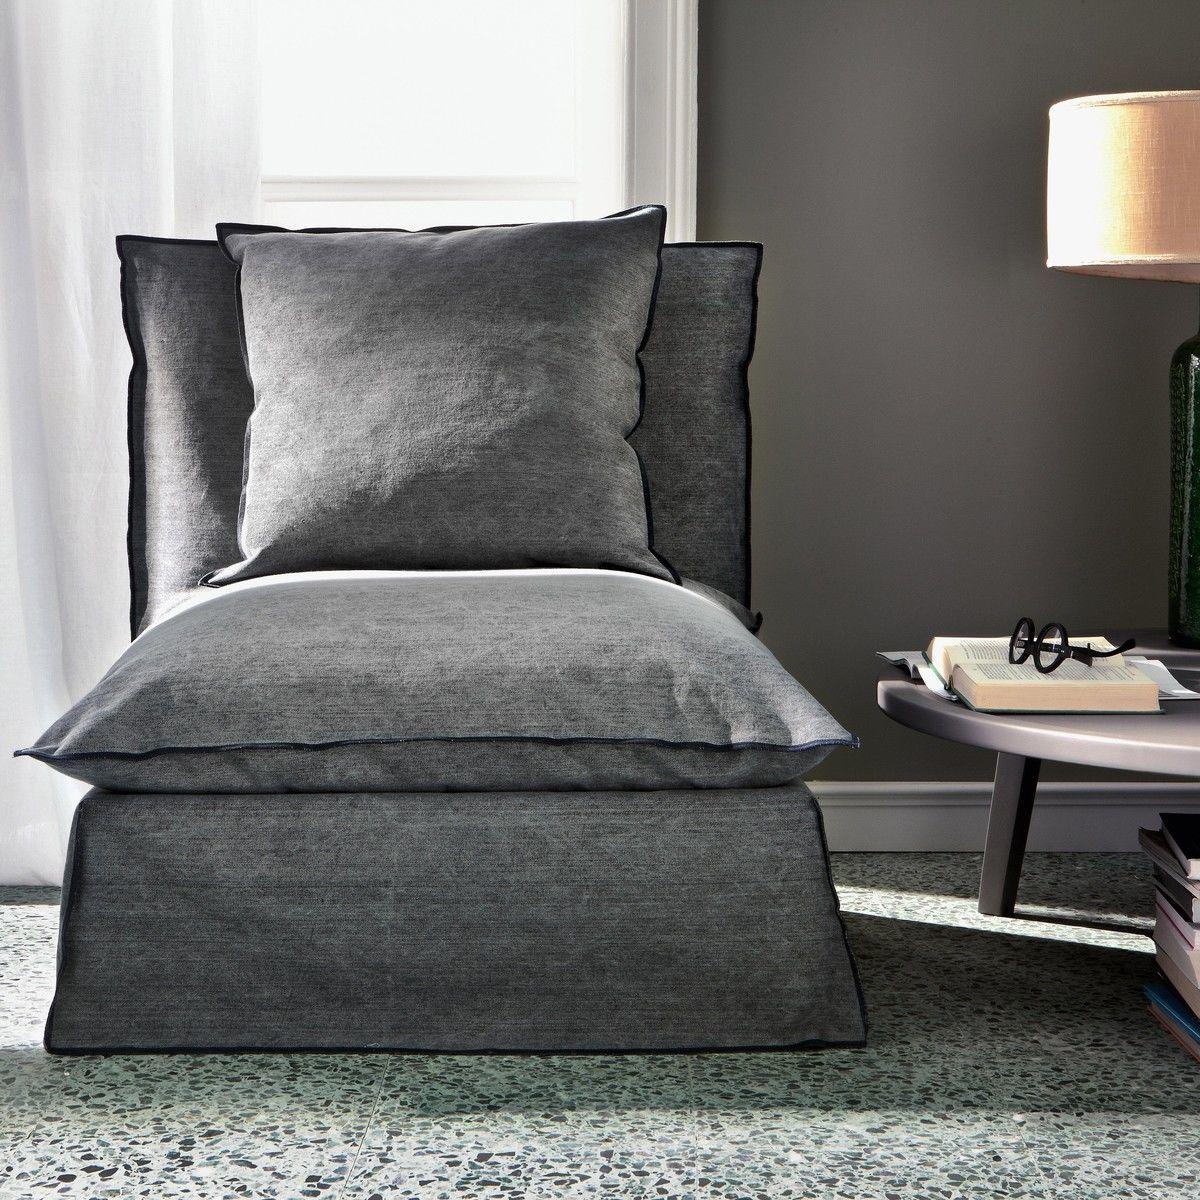 Ghost Sofa Ottoman Gervasoni AmbienteDirectcom